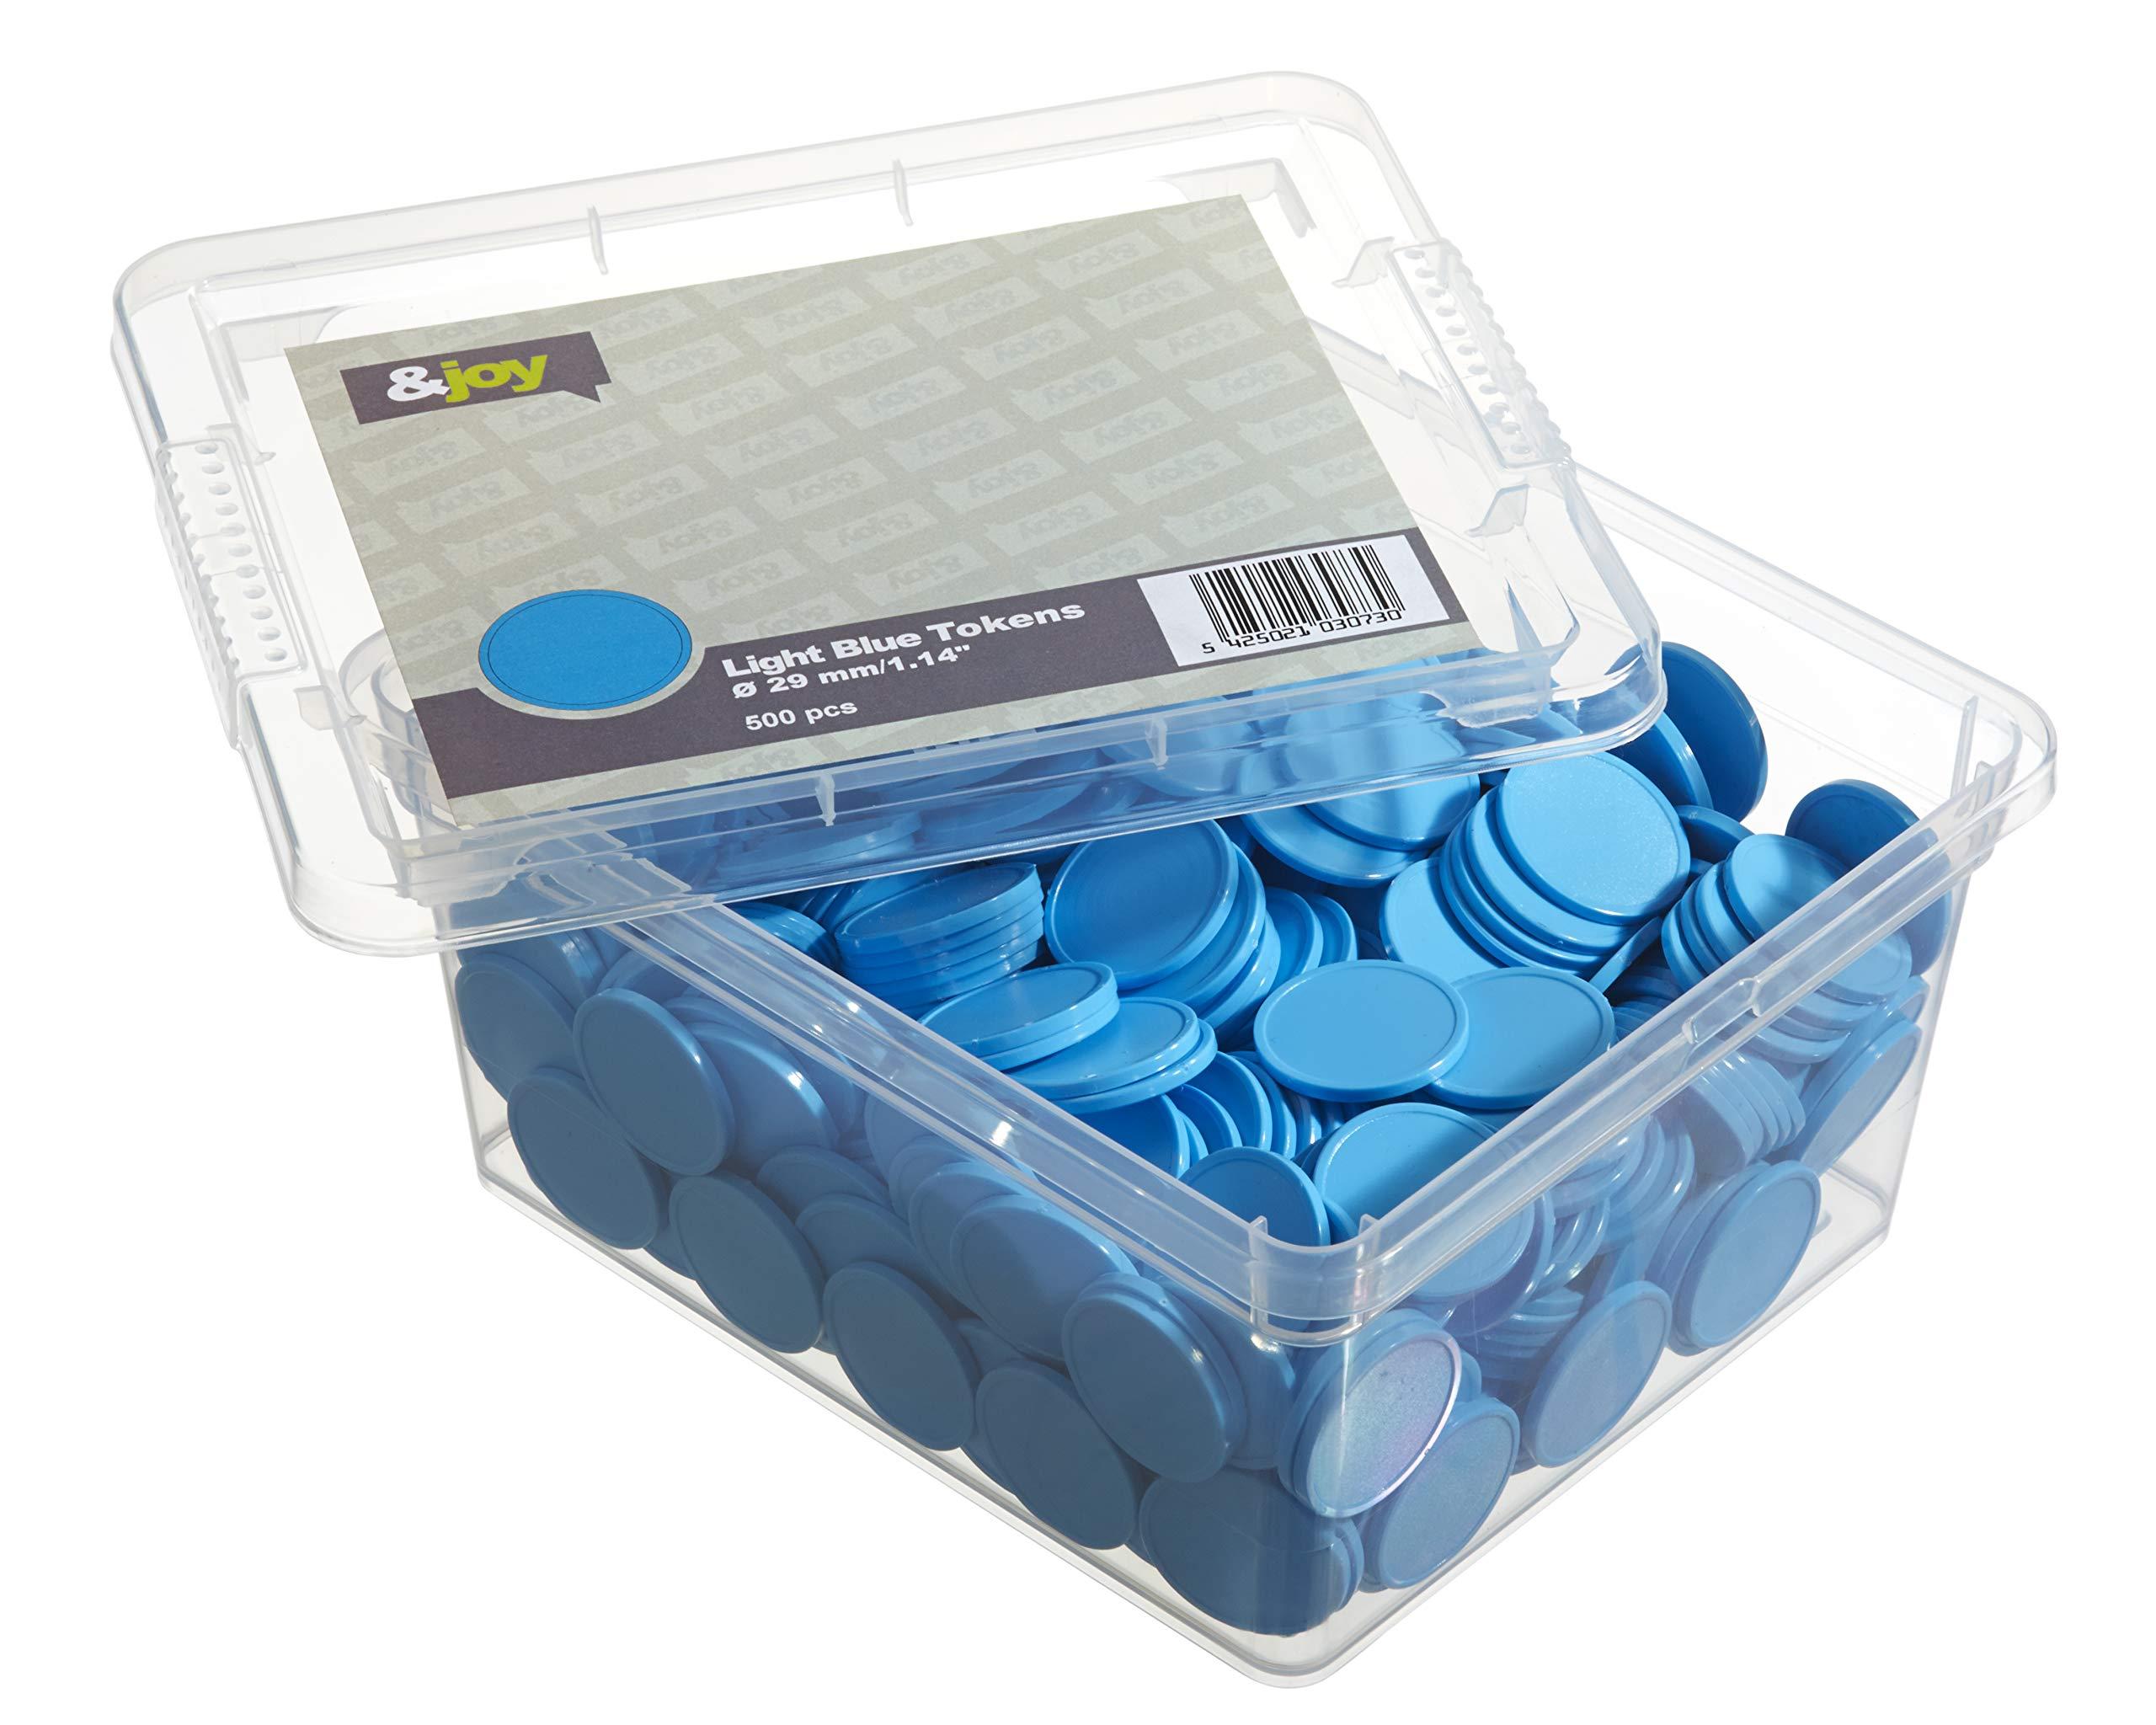 En-Joy Blank Plastic Tokens - 500 Coins - 29 mm - Light Blue